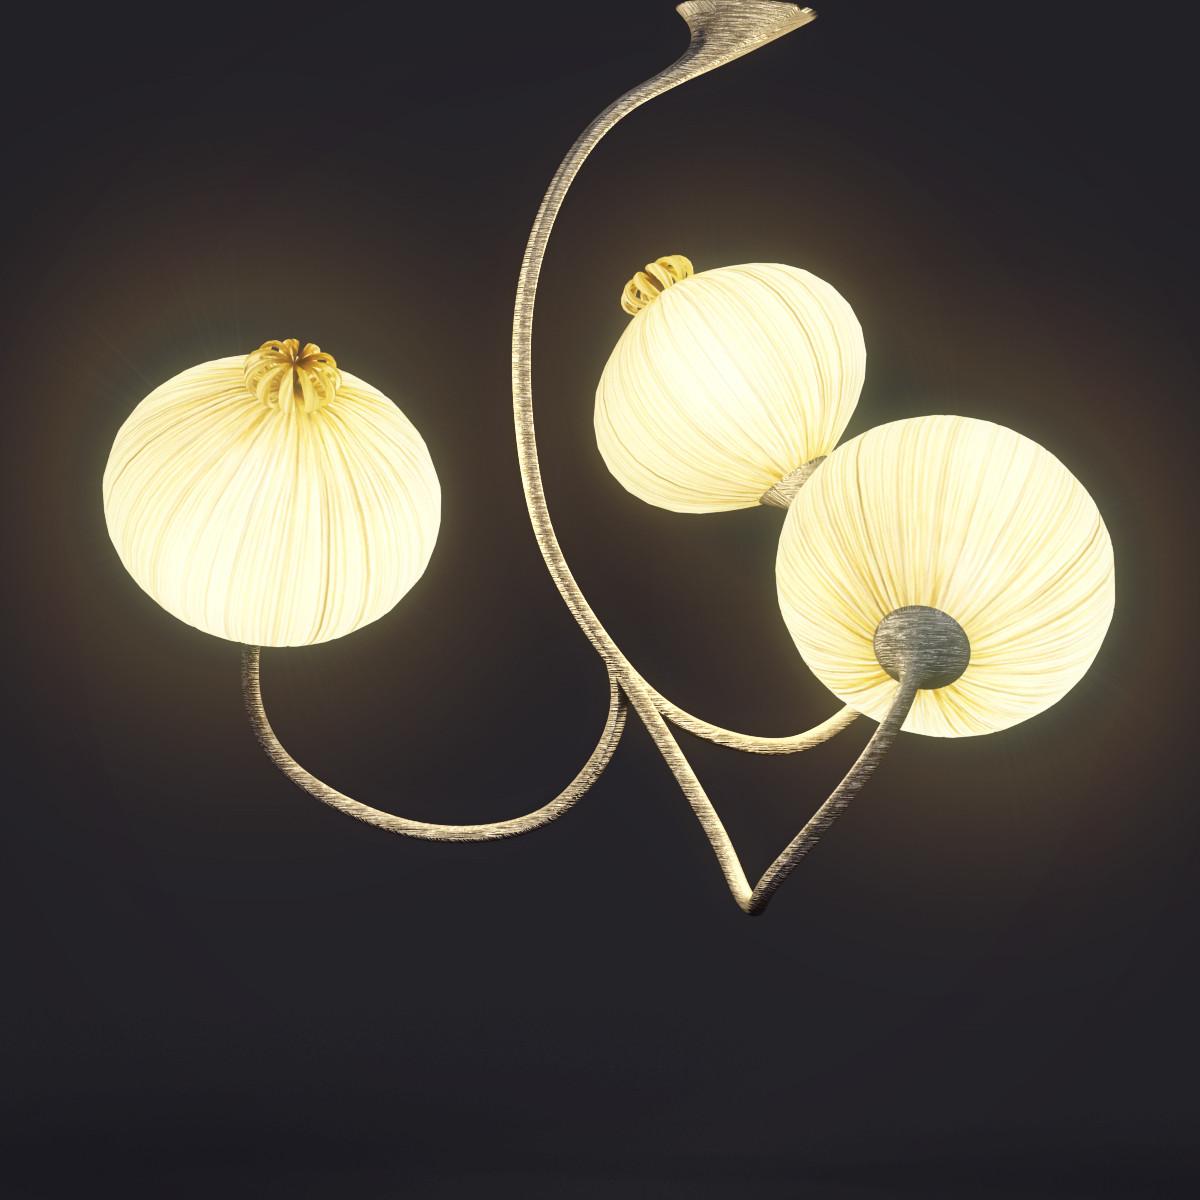 Aqua Creations 3Palm pendant light